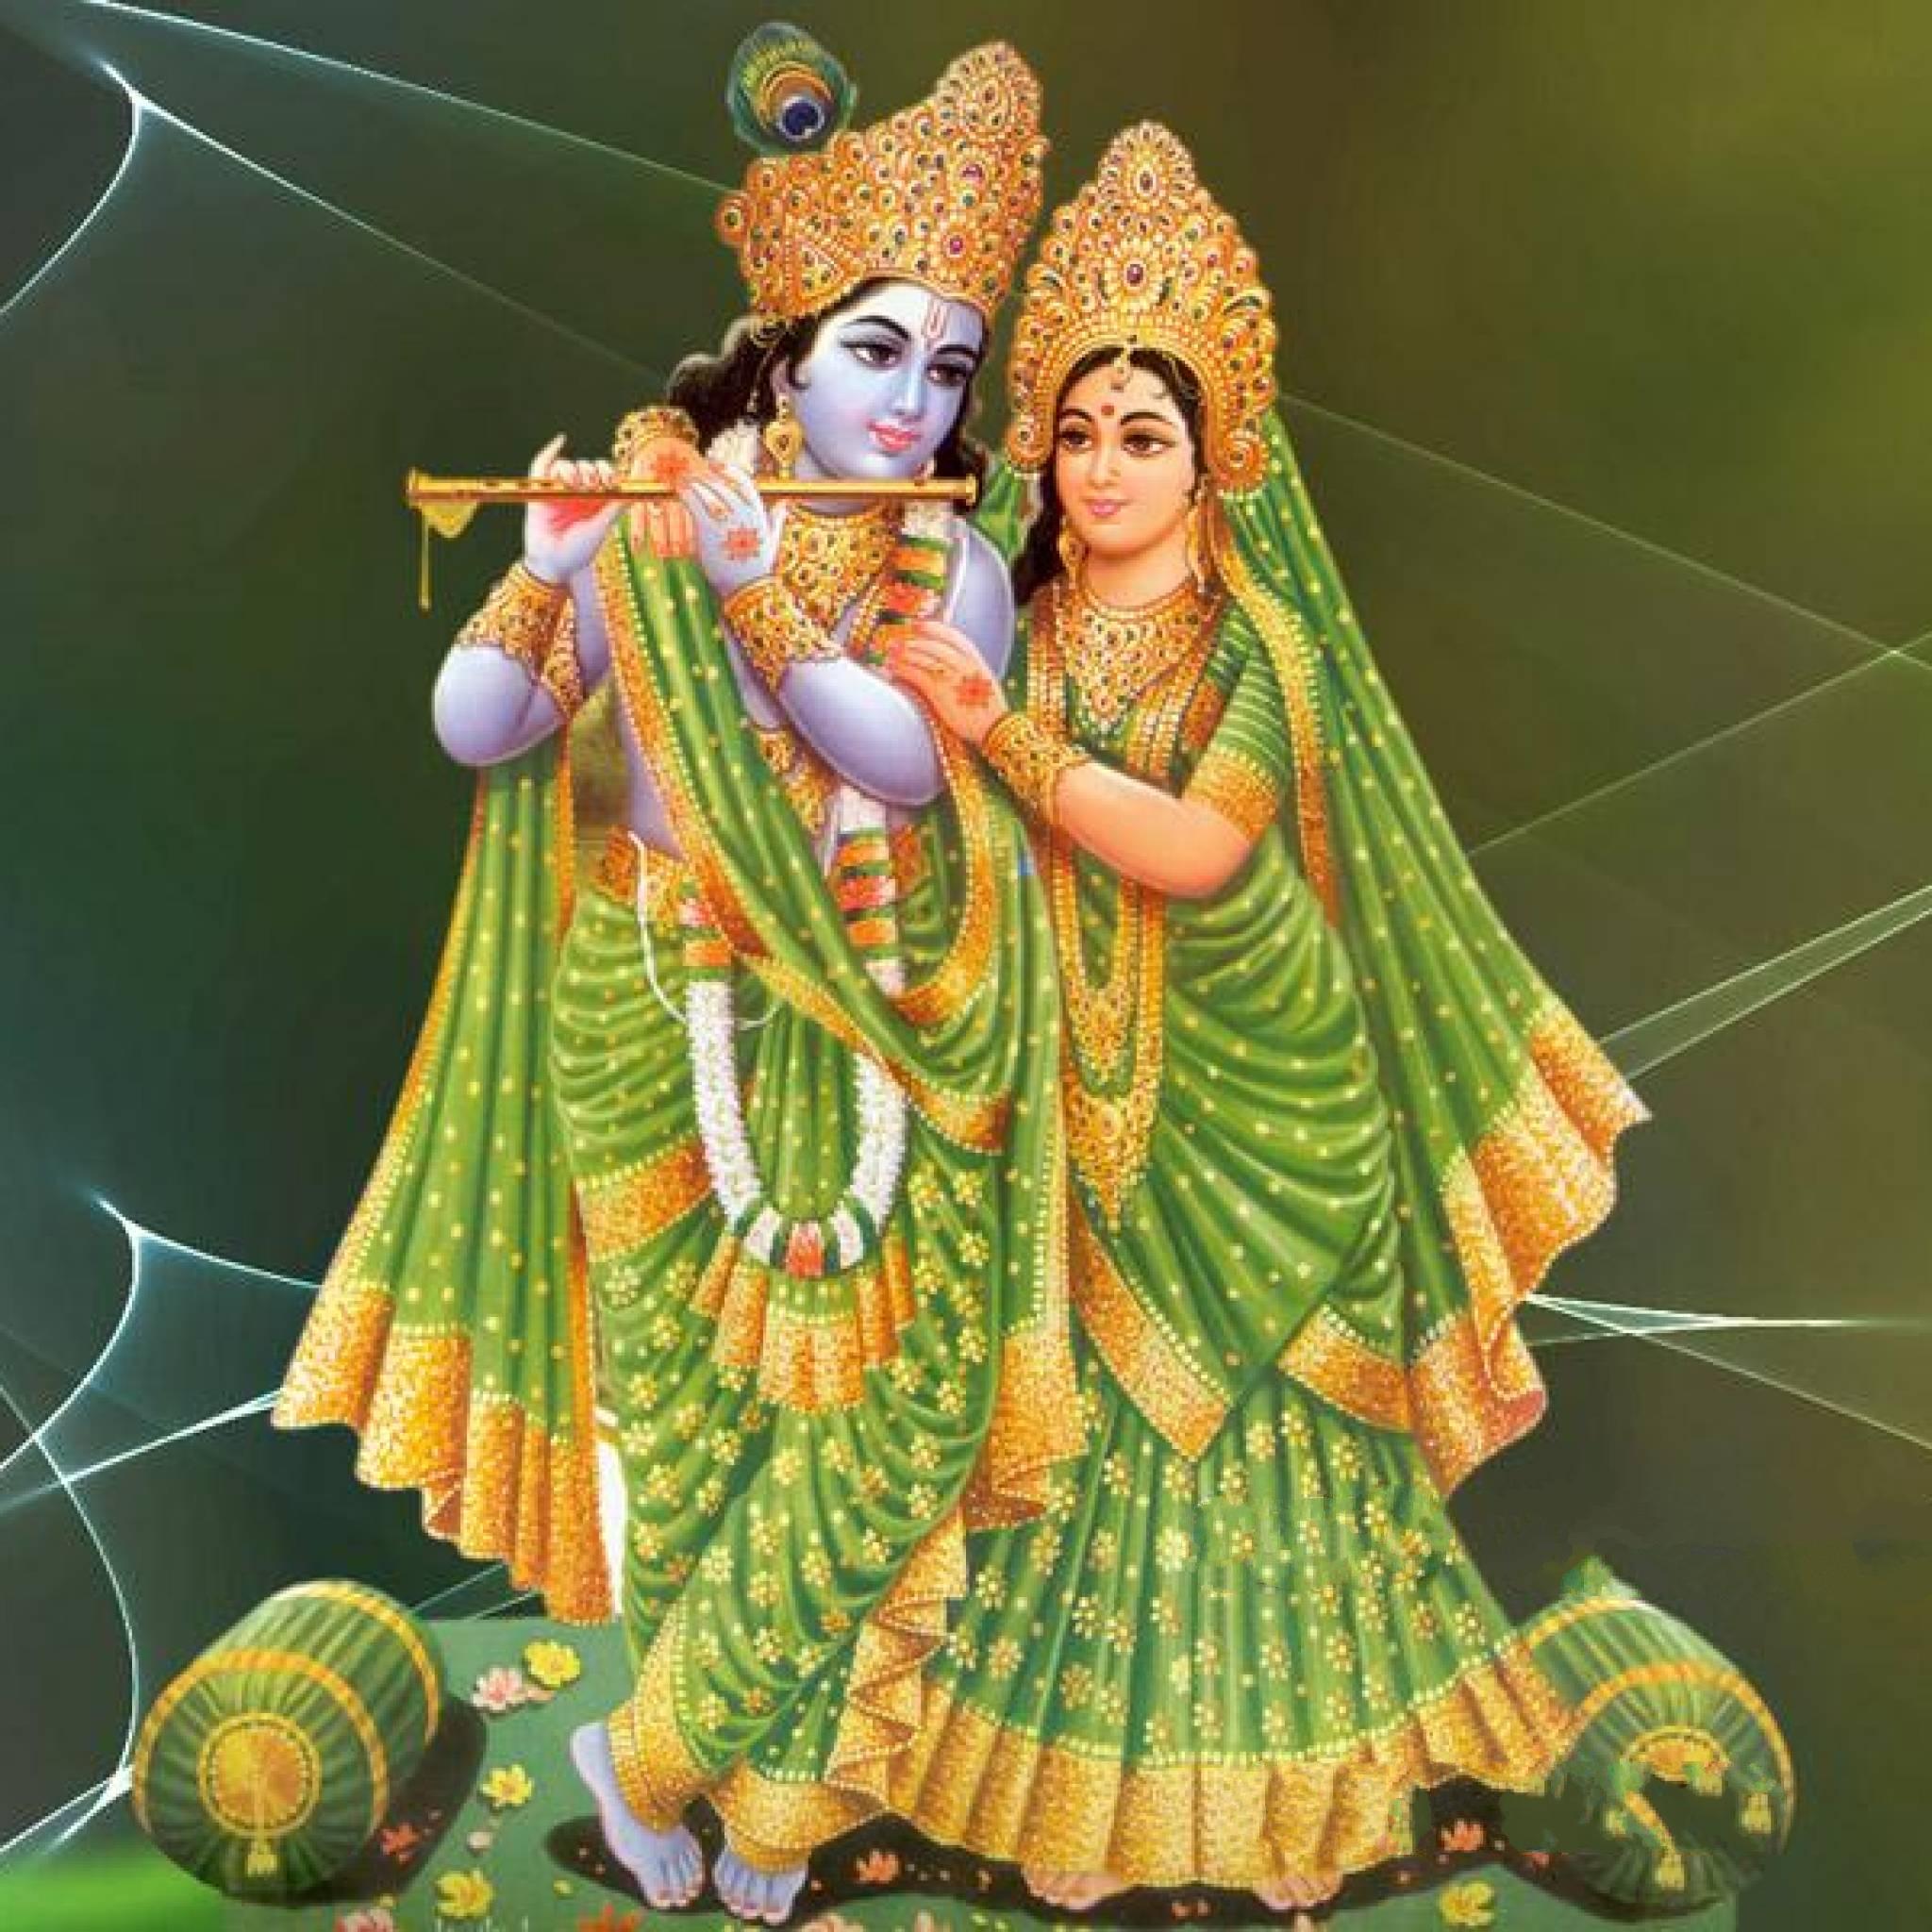 radah krishna hd png download god couple radha krishna 2048 x 2048 wallpapers 4565799 hindu god goddess hinduism 2048